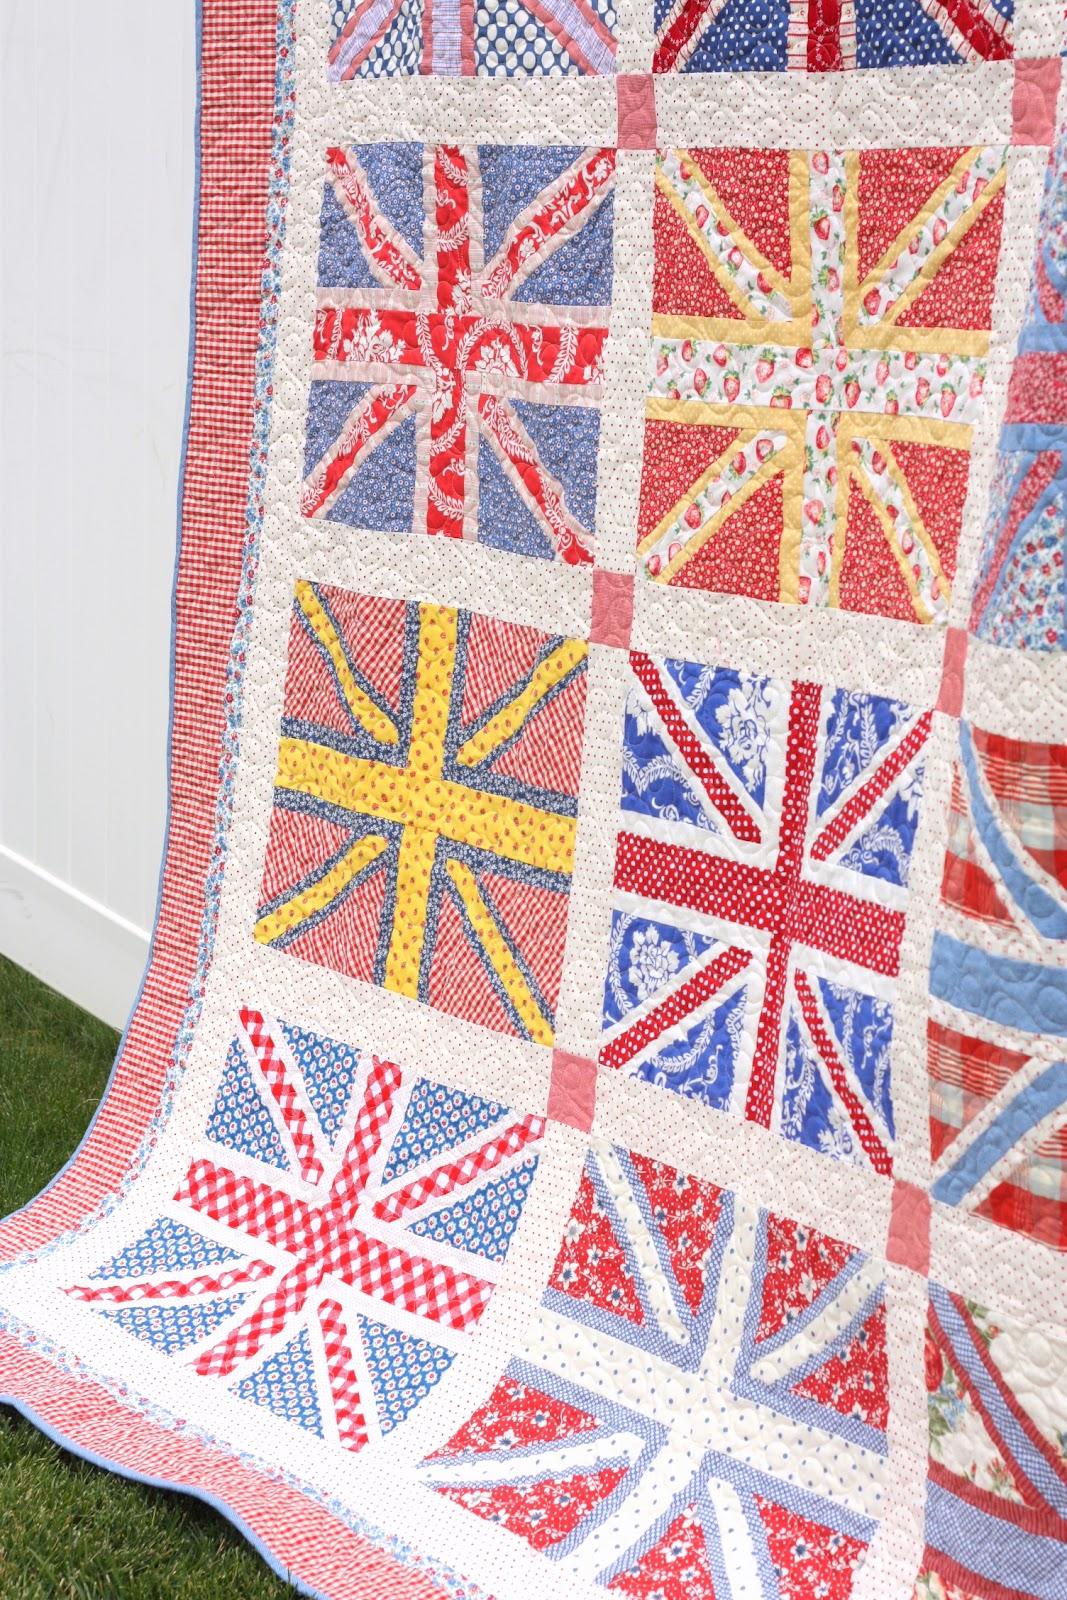 Union Jack Quilt Pattern : union jack quilt - Adamdwight.com